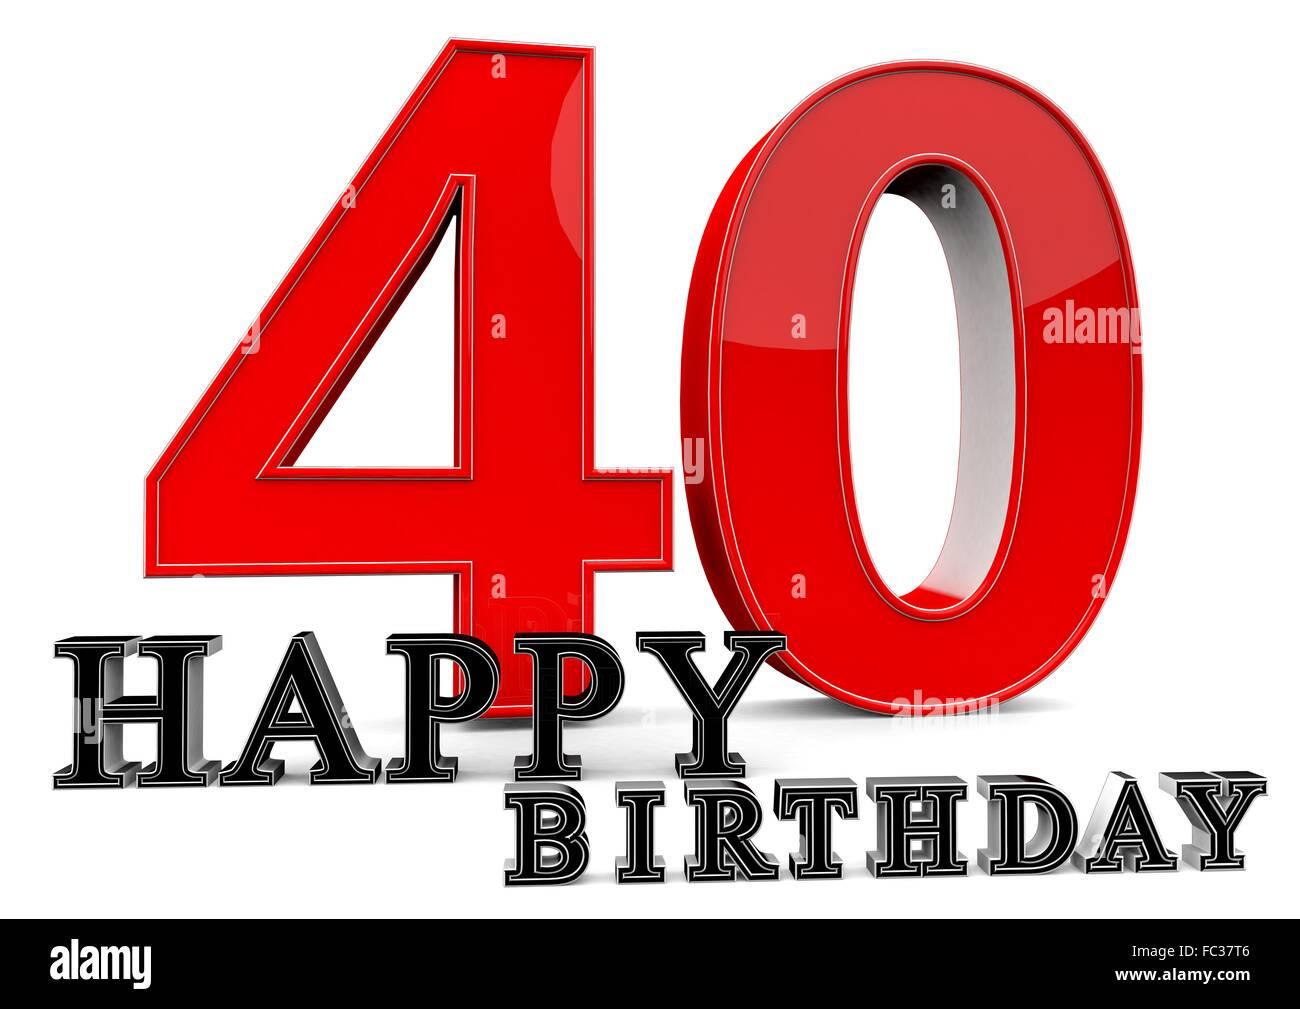 happy birthday zum 40 geburtstag stock photo royalty free image 93499734 alamy. Black Bedroom Furniture Sets. Home Design Ideas